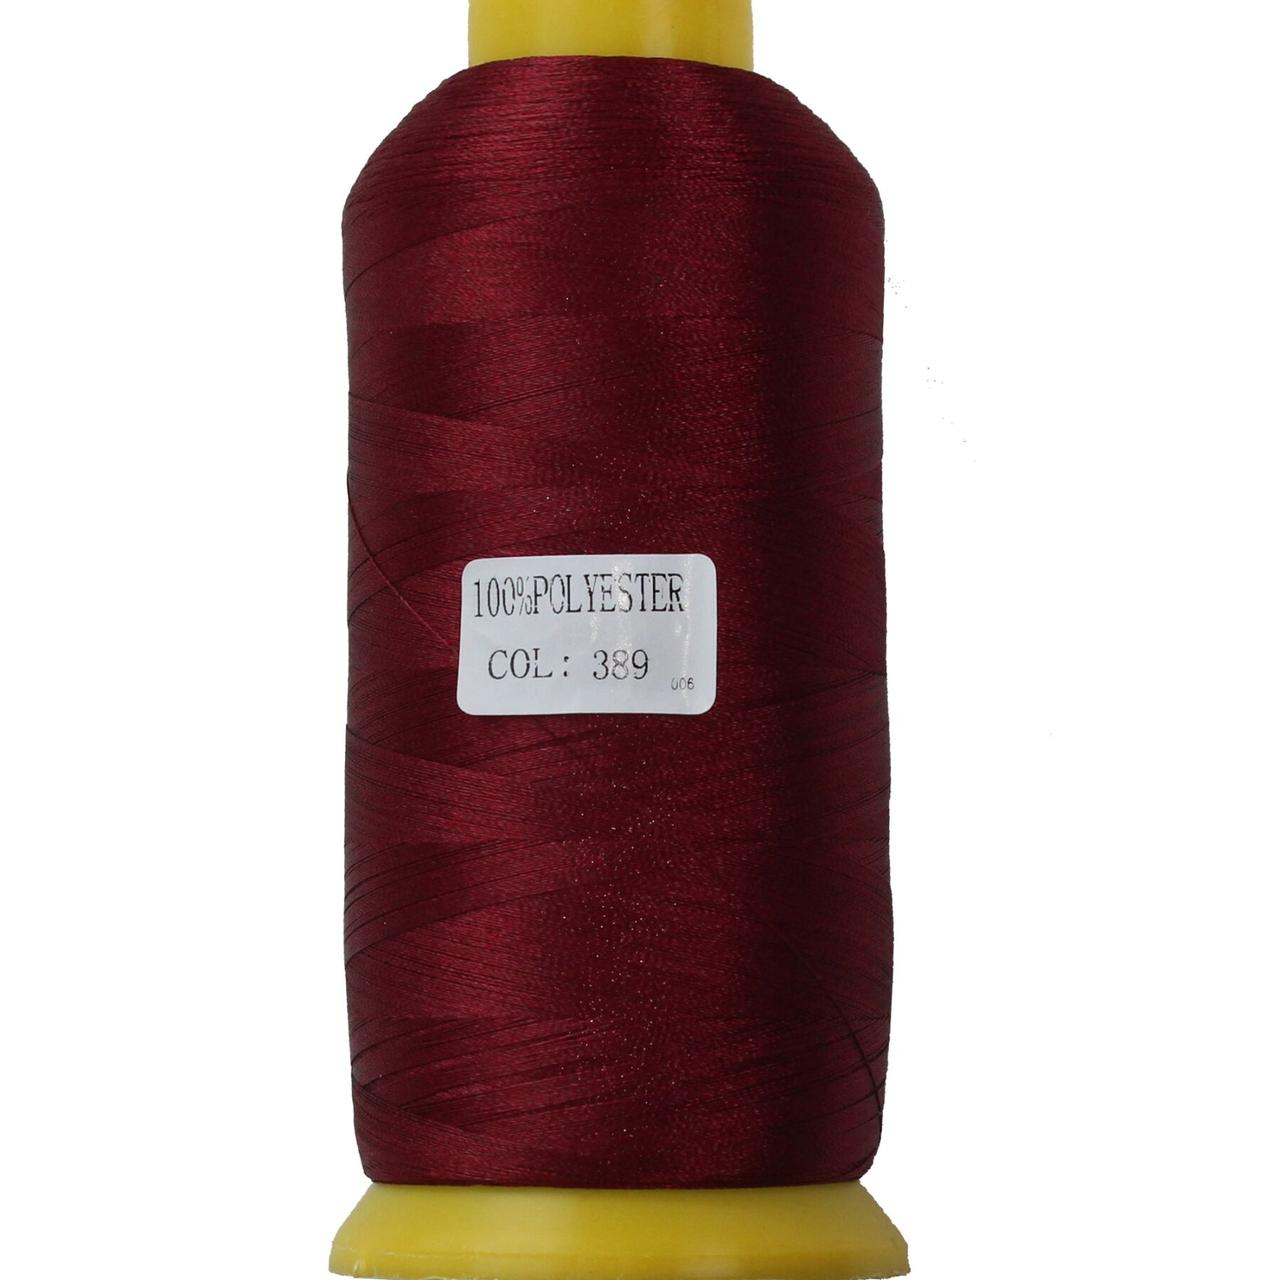 Нитка поліестер 40, 120D/2, колір 389, Козачок-ТМ